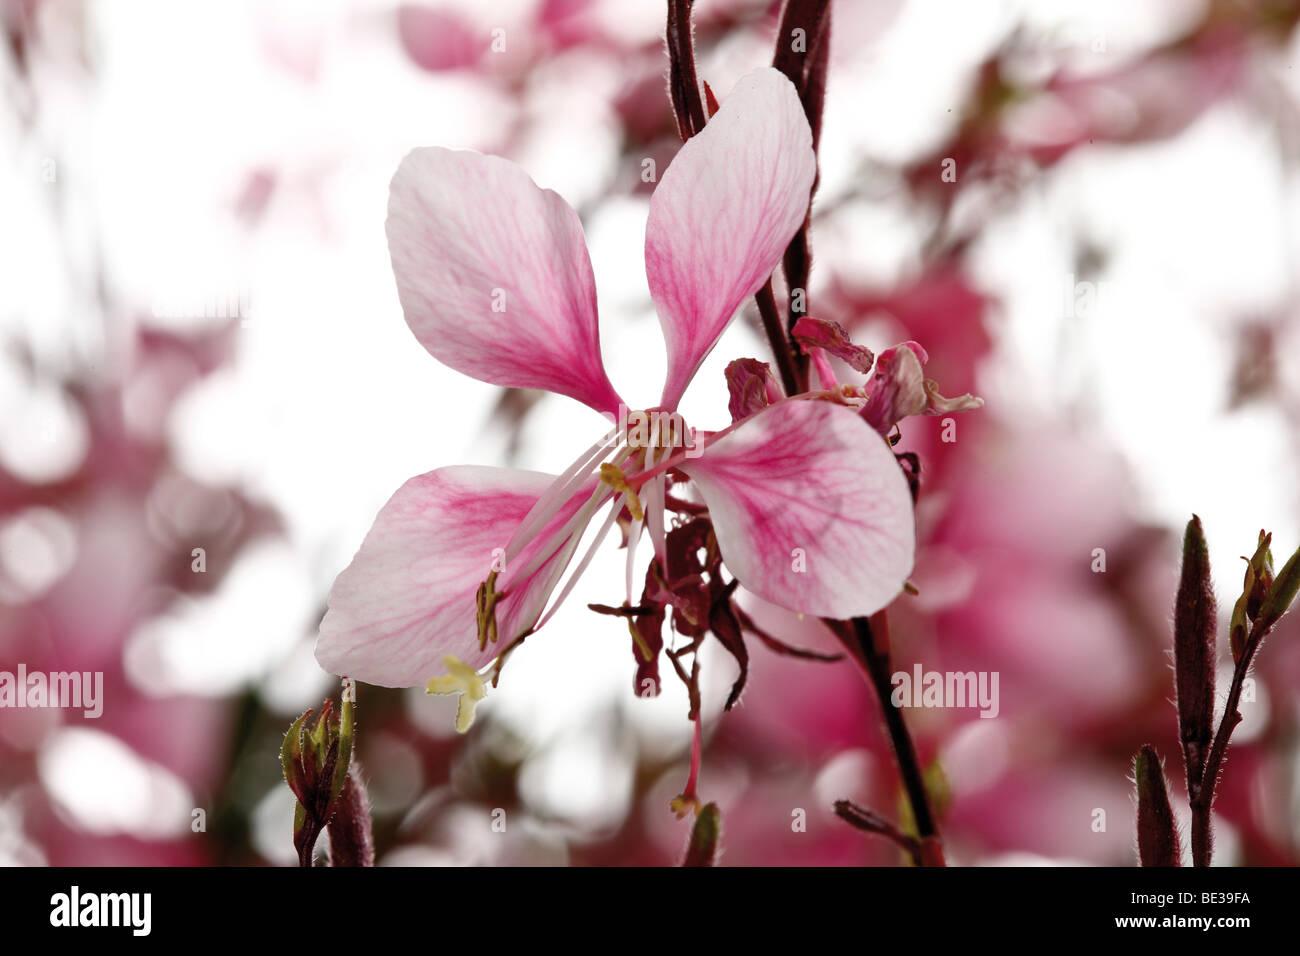 Gaura blossoms - Stock Image